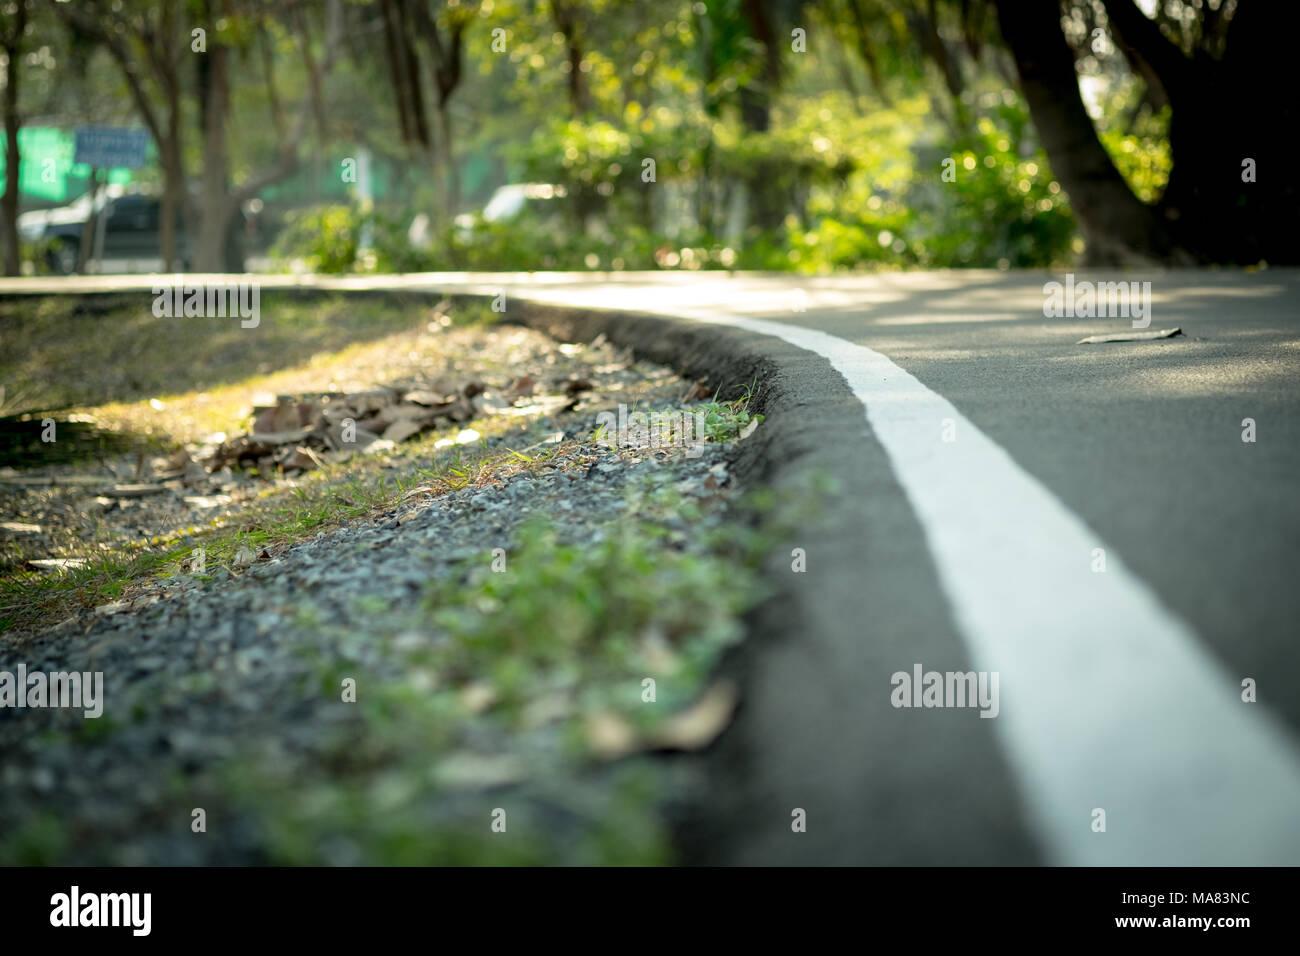 Curve way running and walkway aphalt floor in public park, shot with low depth of field, selective focus. - Stock Image